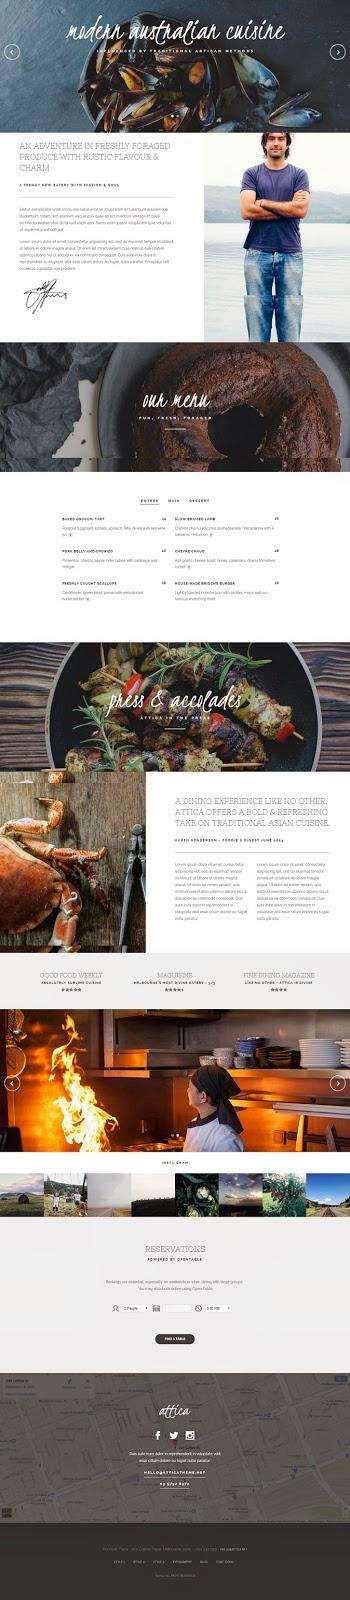 Attica One Page Restaurant Joomla Template